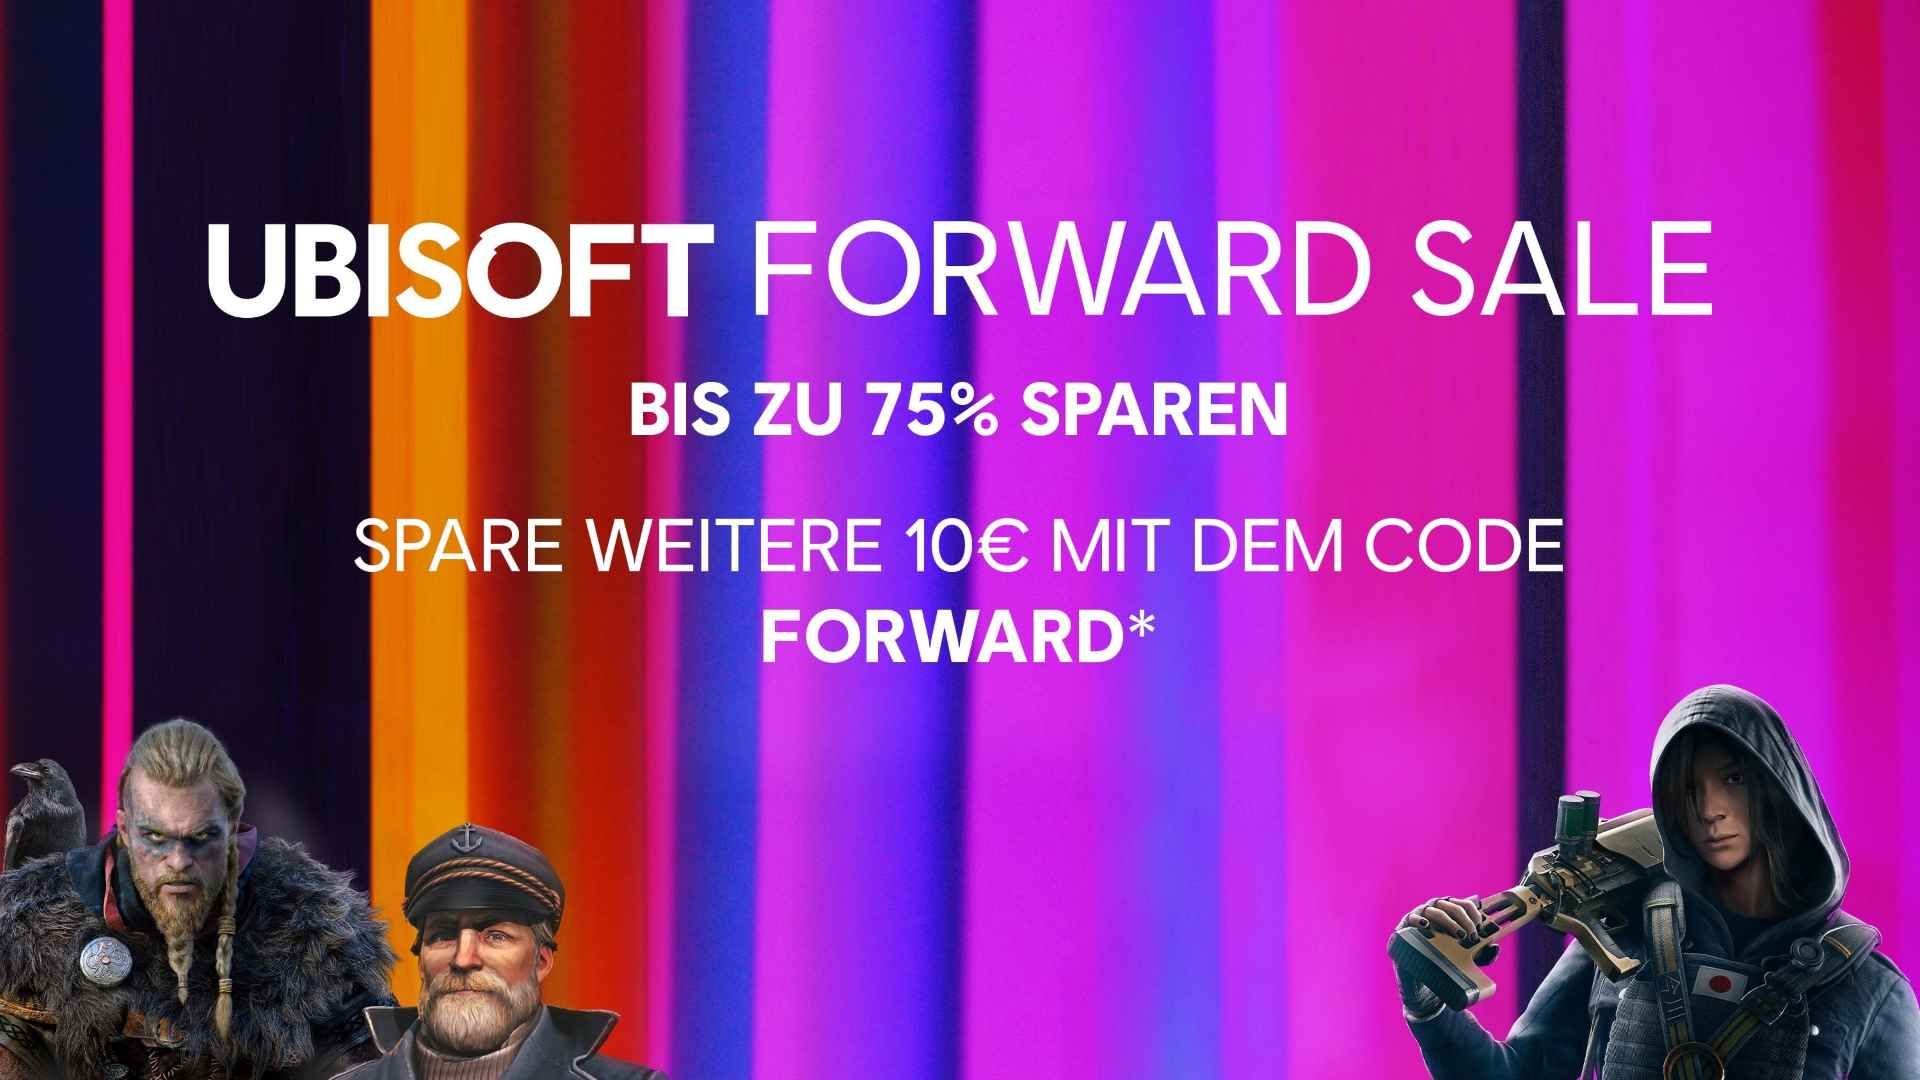 Ubisoft Forward Sale - Key Art